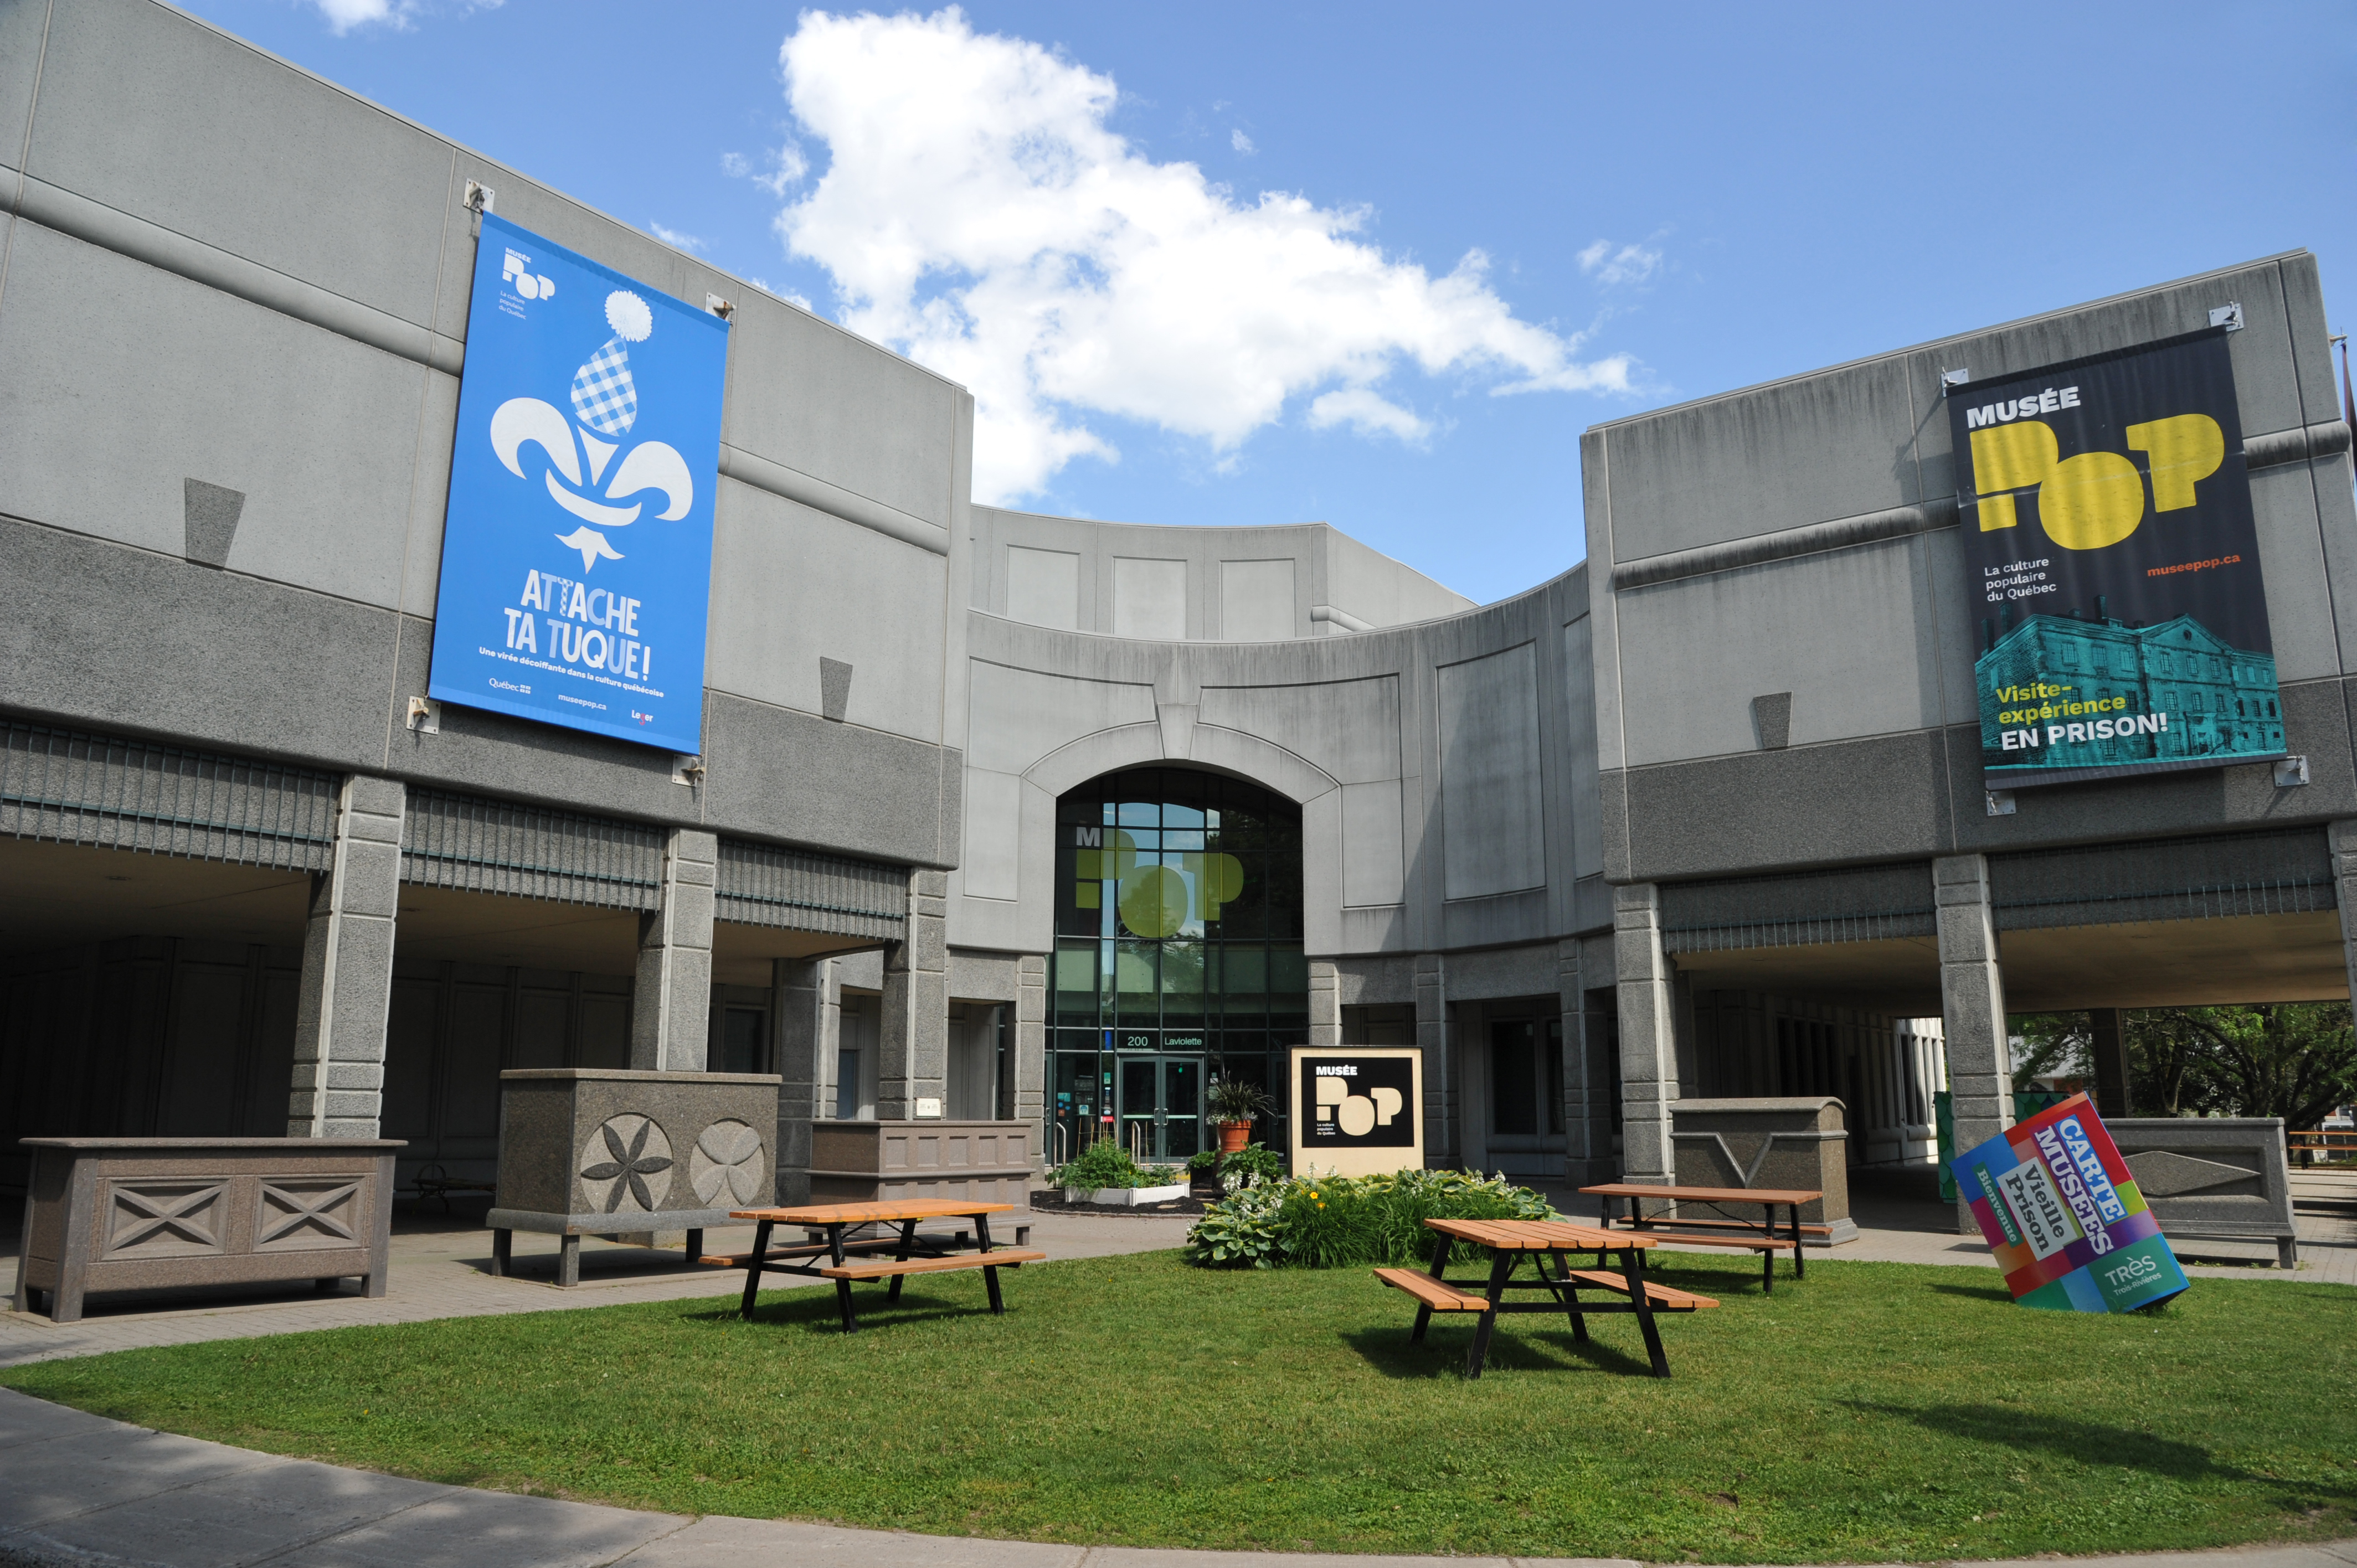 Musée POP (photo Daniel Jalbert) (2)